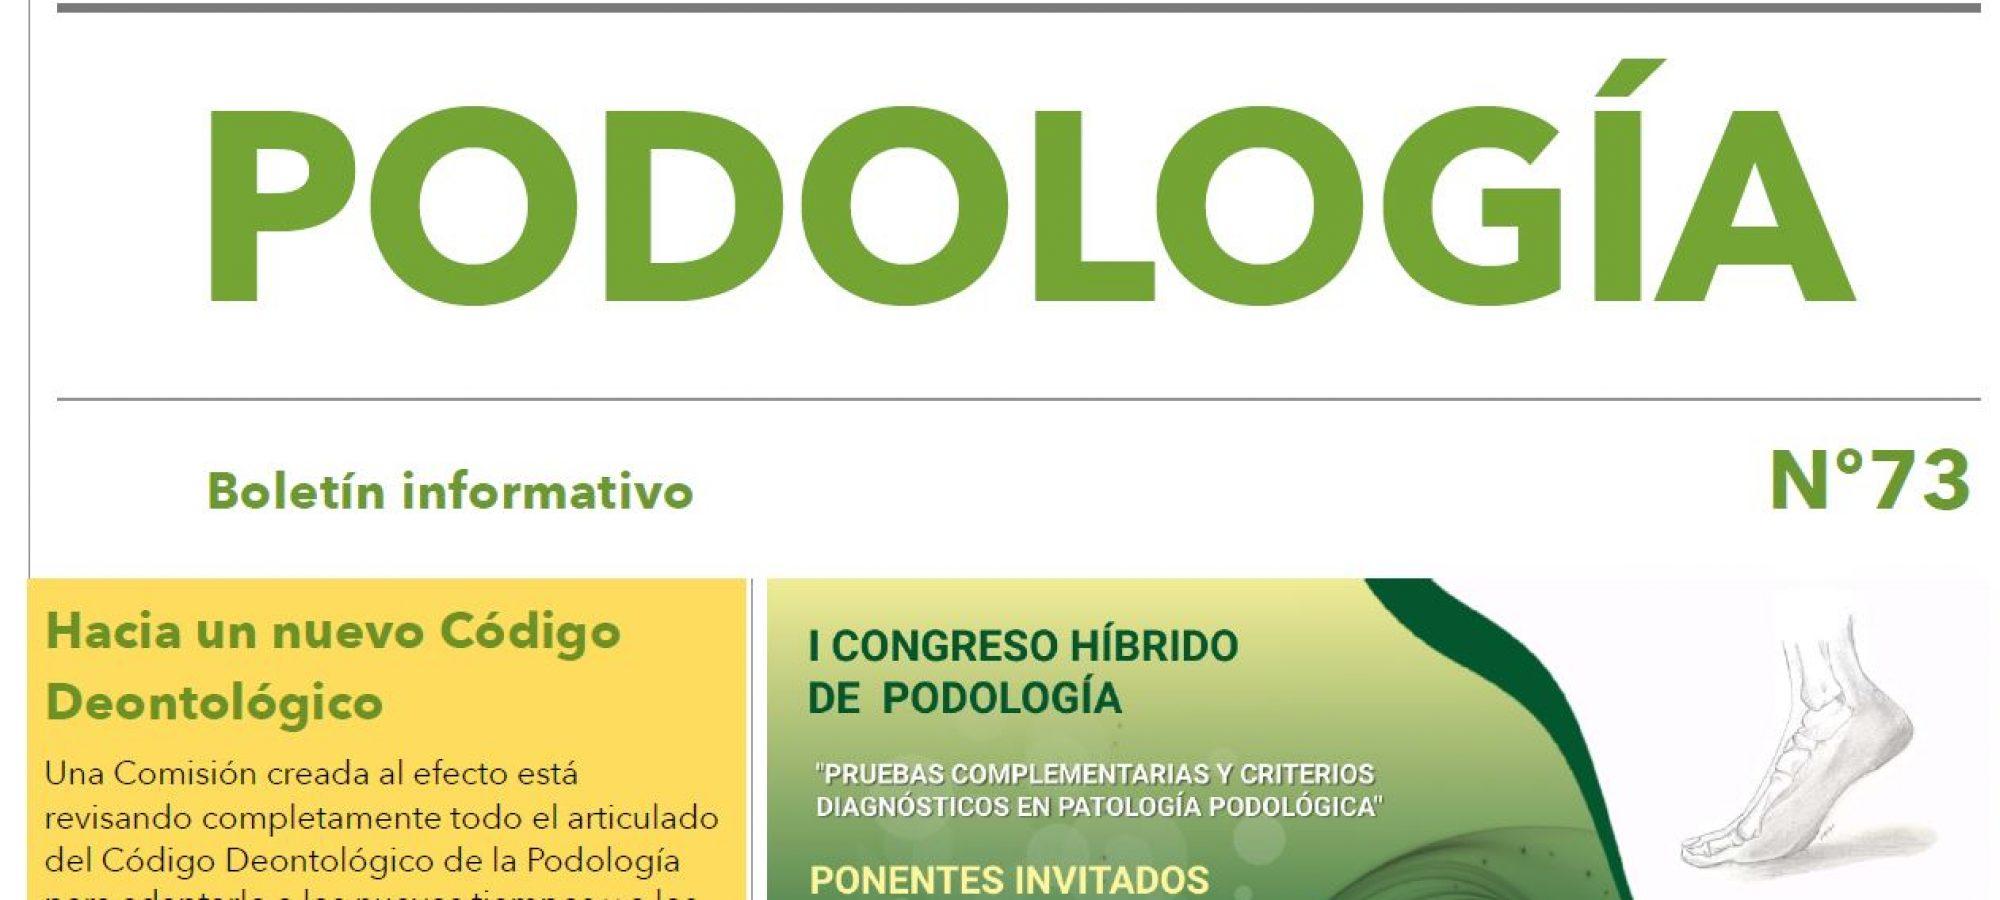 podologia.73